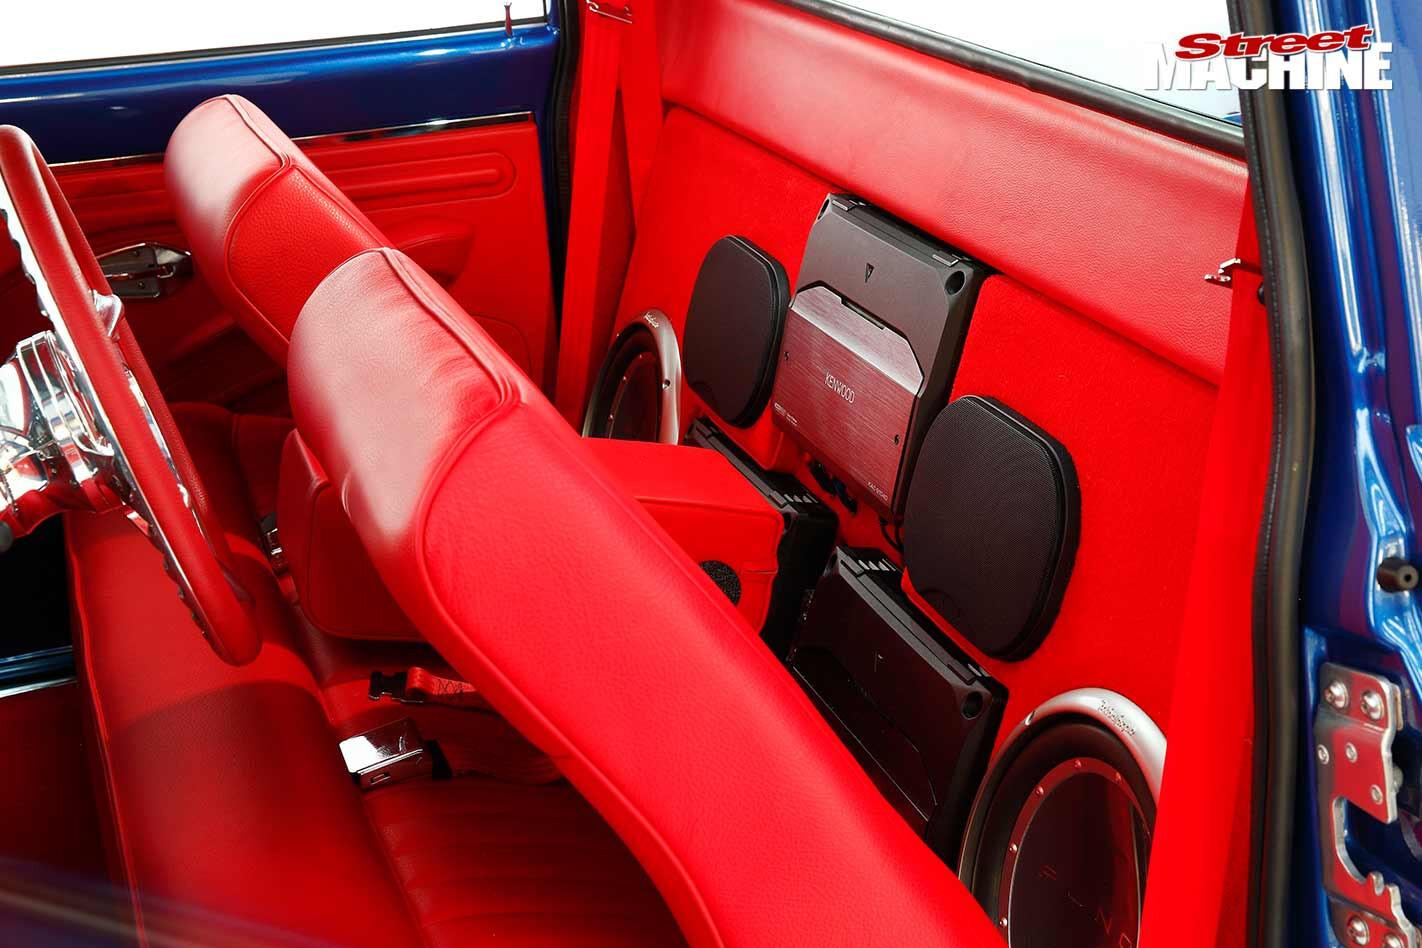 Chev C10 interior